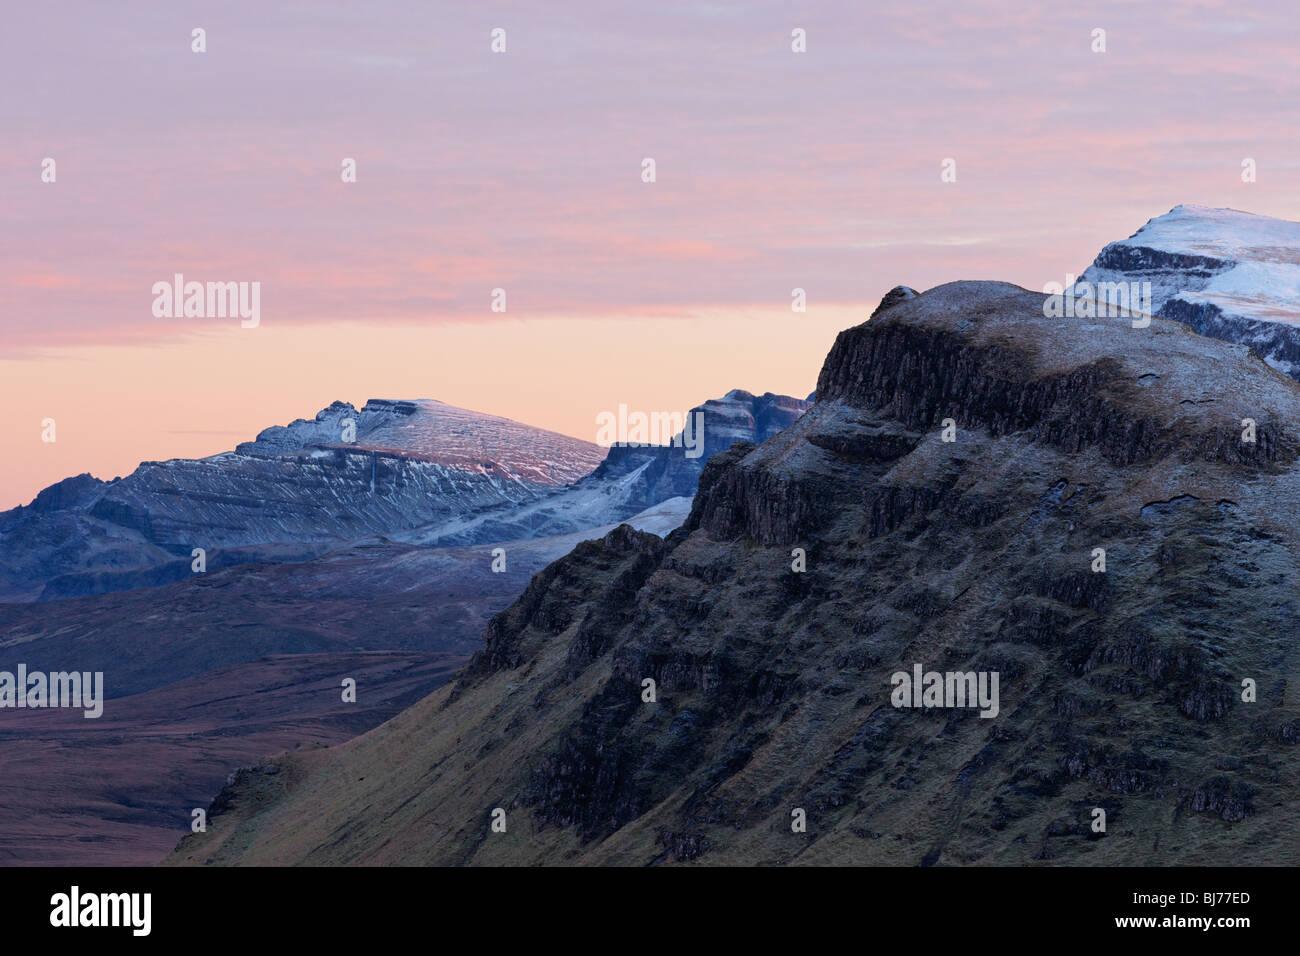 View along the Trotternish scarp slope to The Storr, Isle of Skye, Scotland, UK. - Stock Image